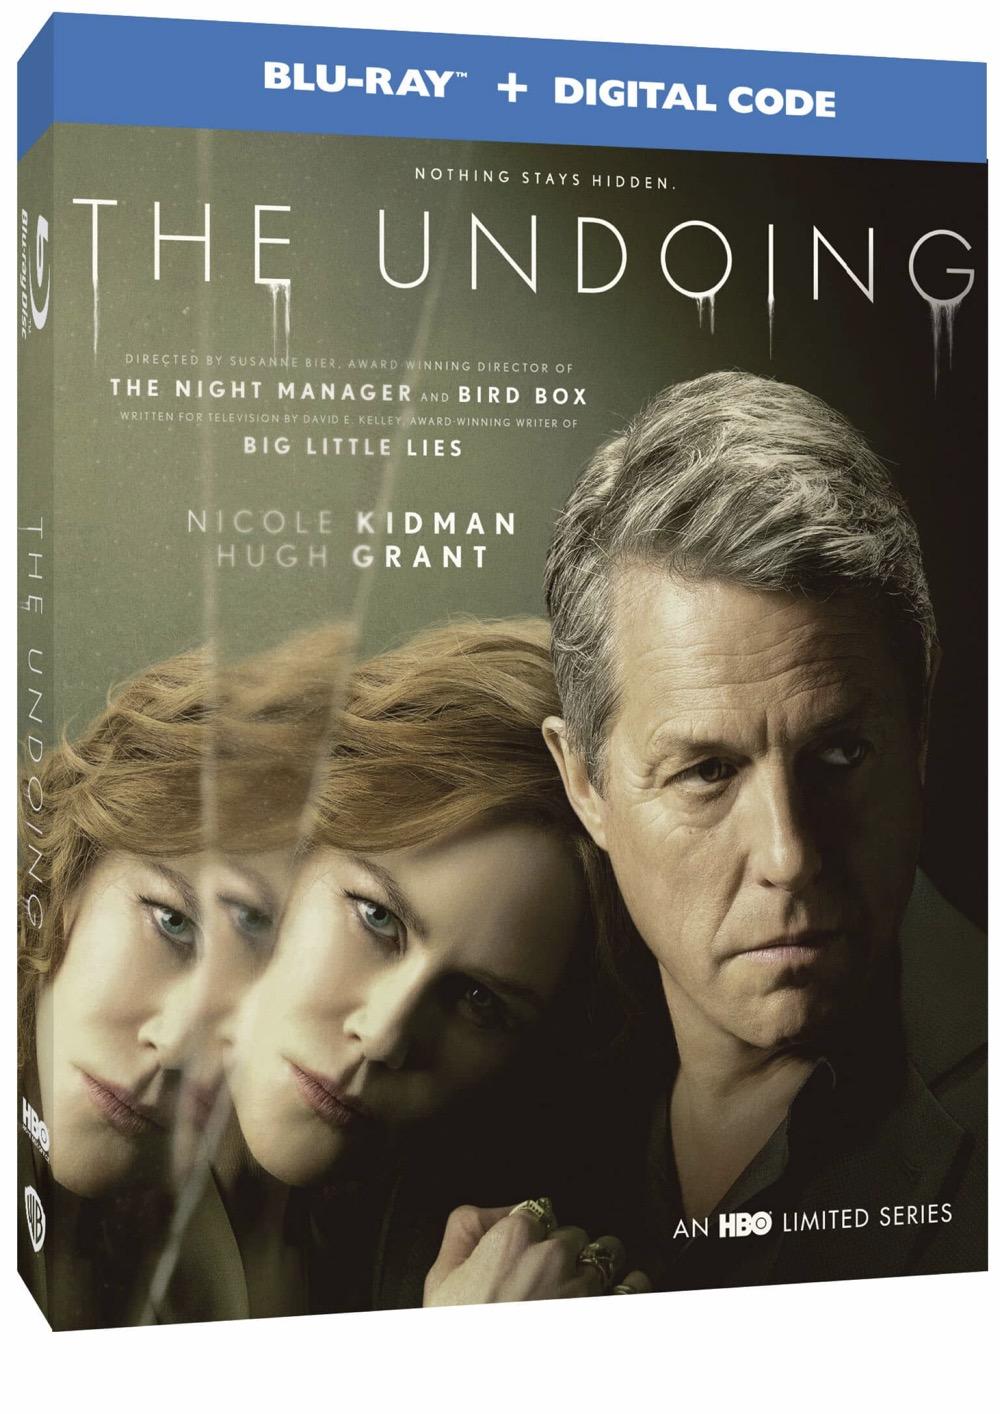 The Undoing Blu-ray + Digital Code Box Cover Artwork